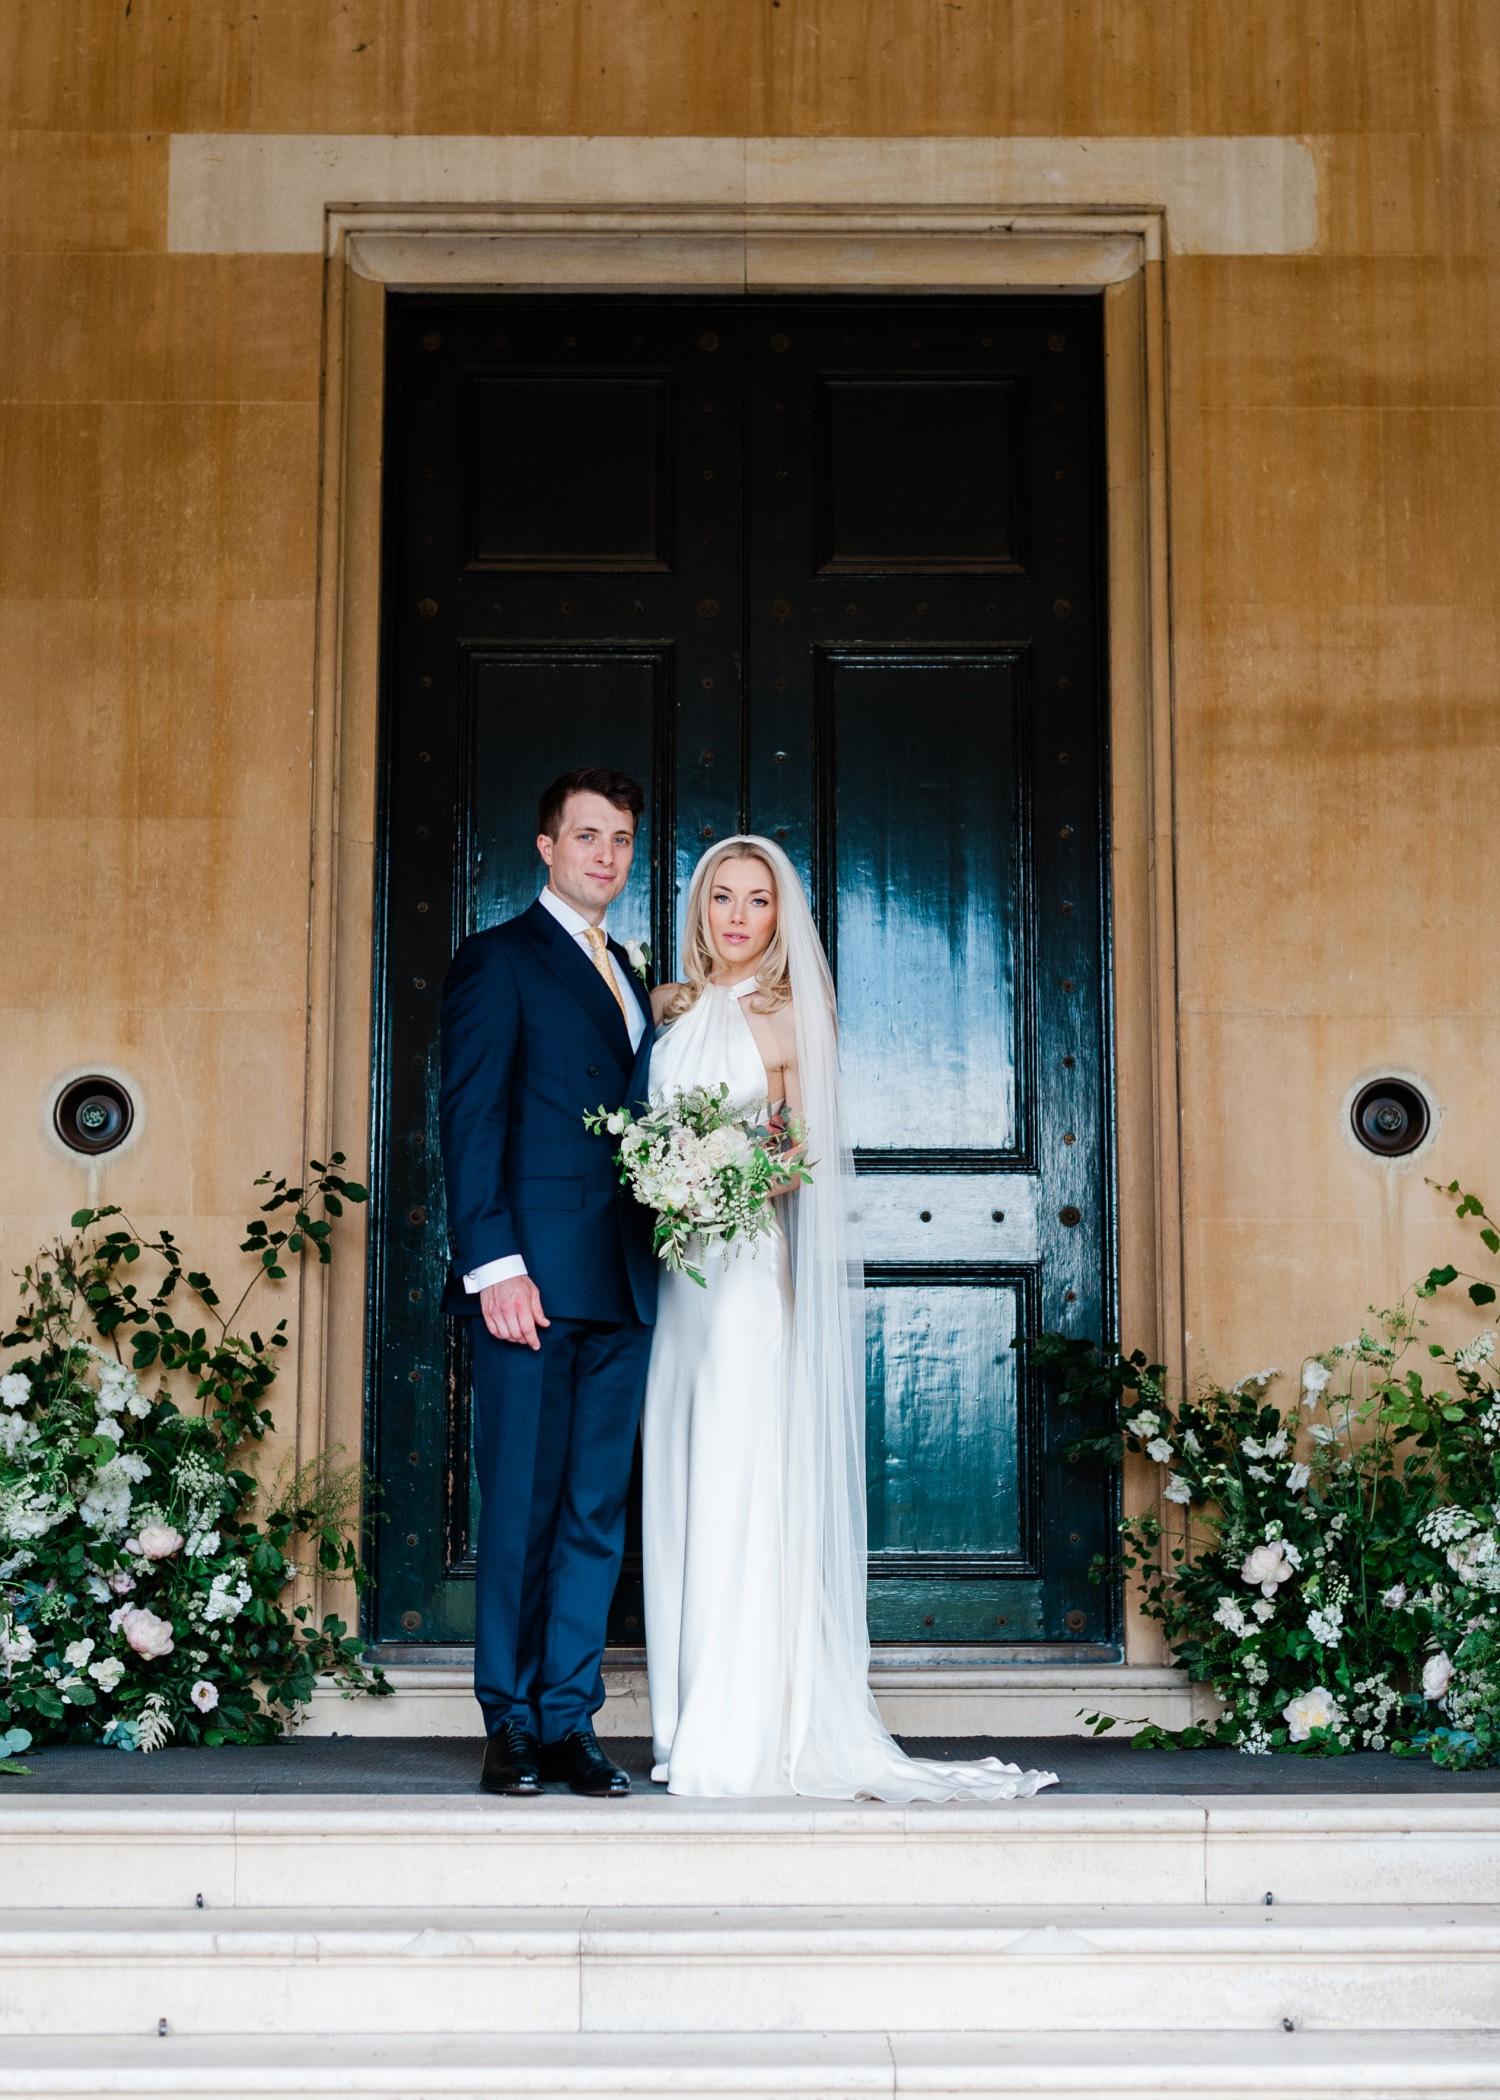 Littleton-Rose-Syon-House-London-Wedding-Planner-Bride-and-Groom.jpg